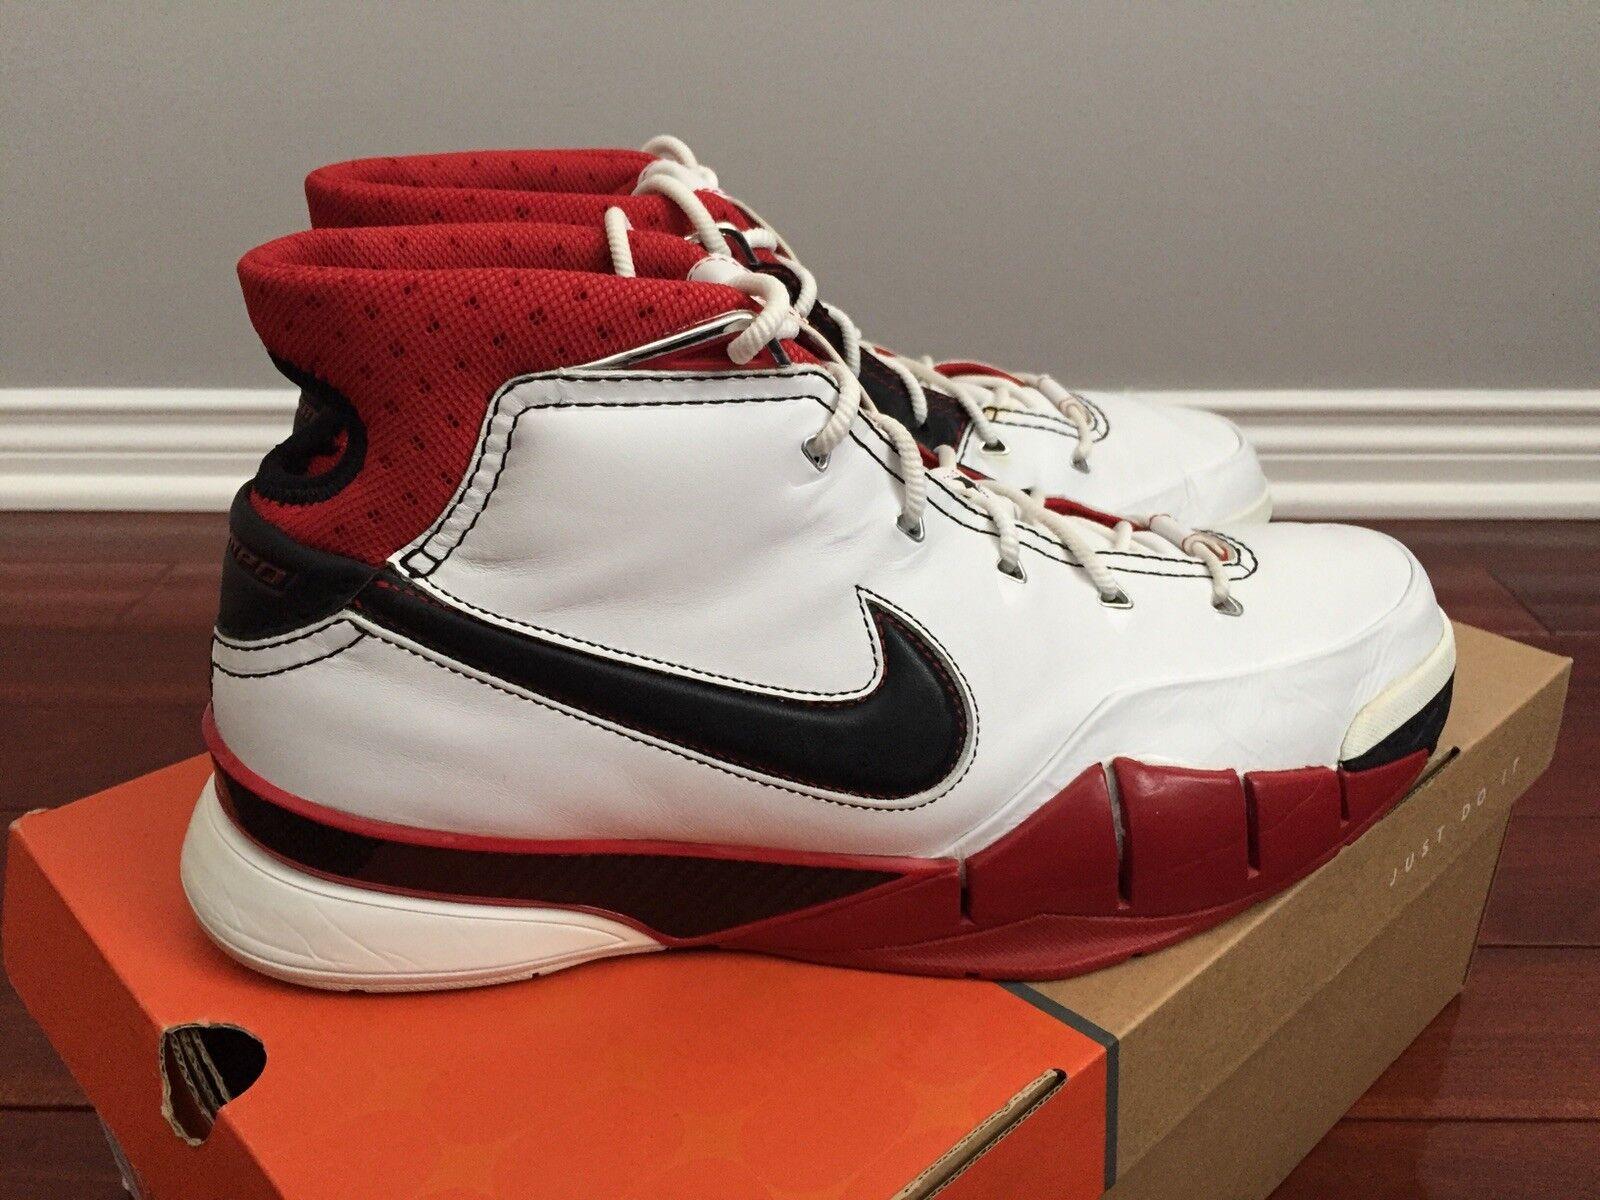 Nike Zoom Kobe 1 Original Size 11.5 All-Star colorway Predro